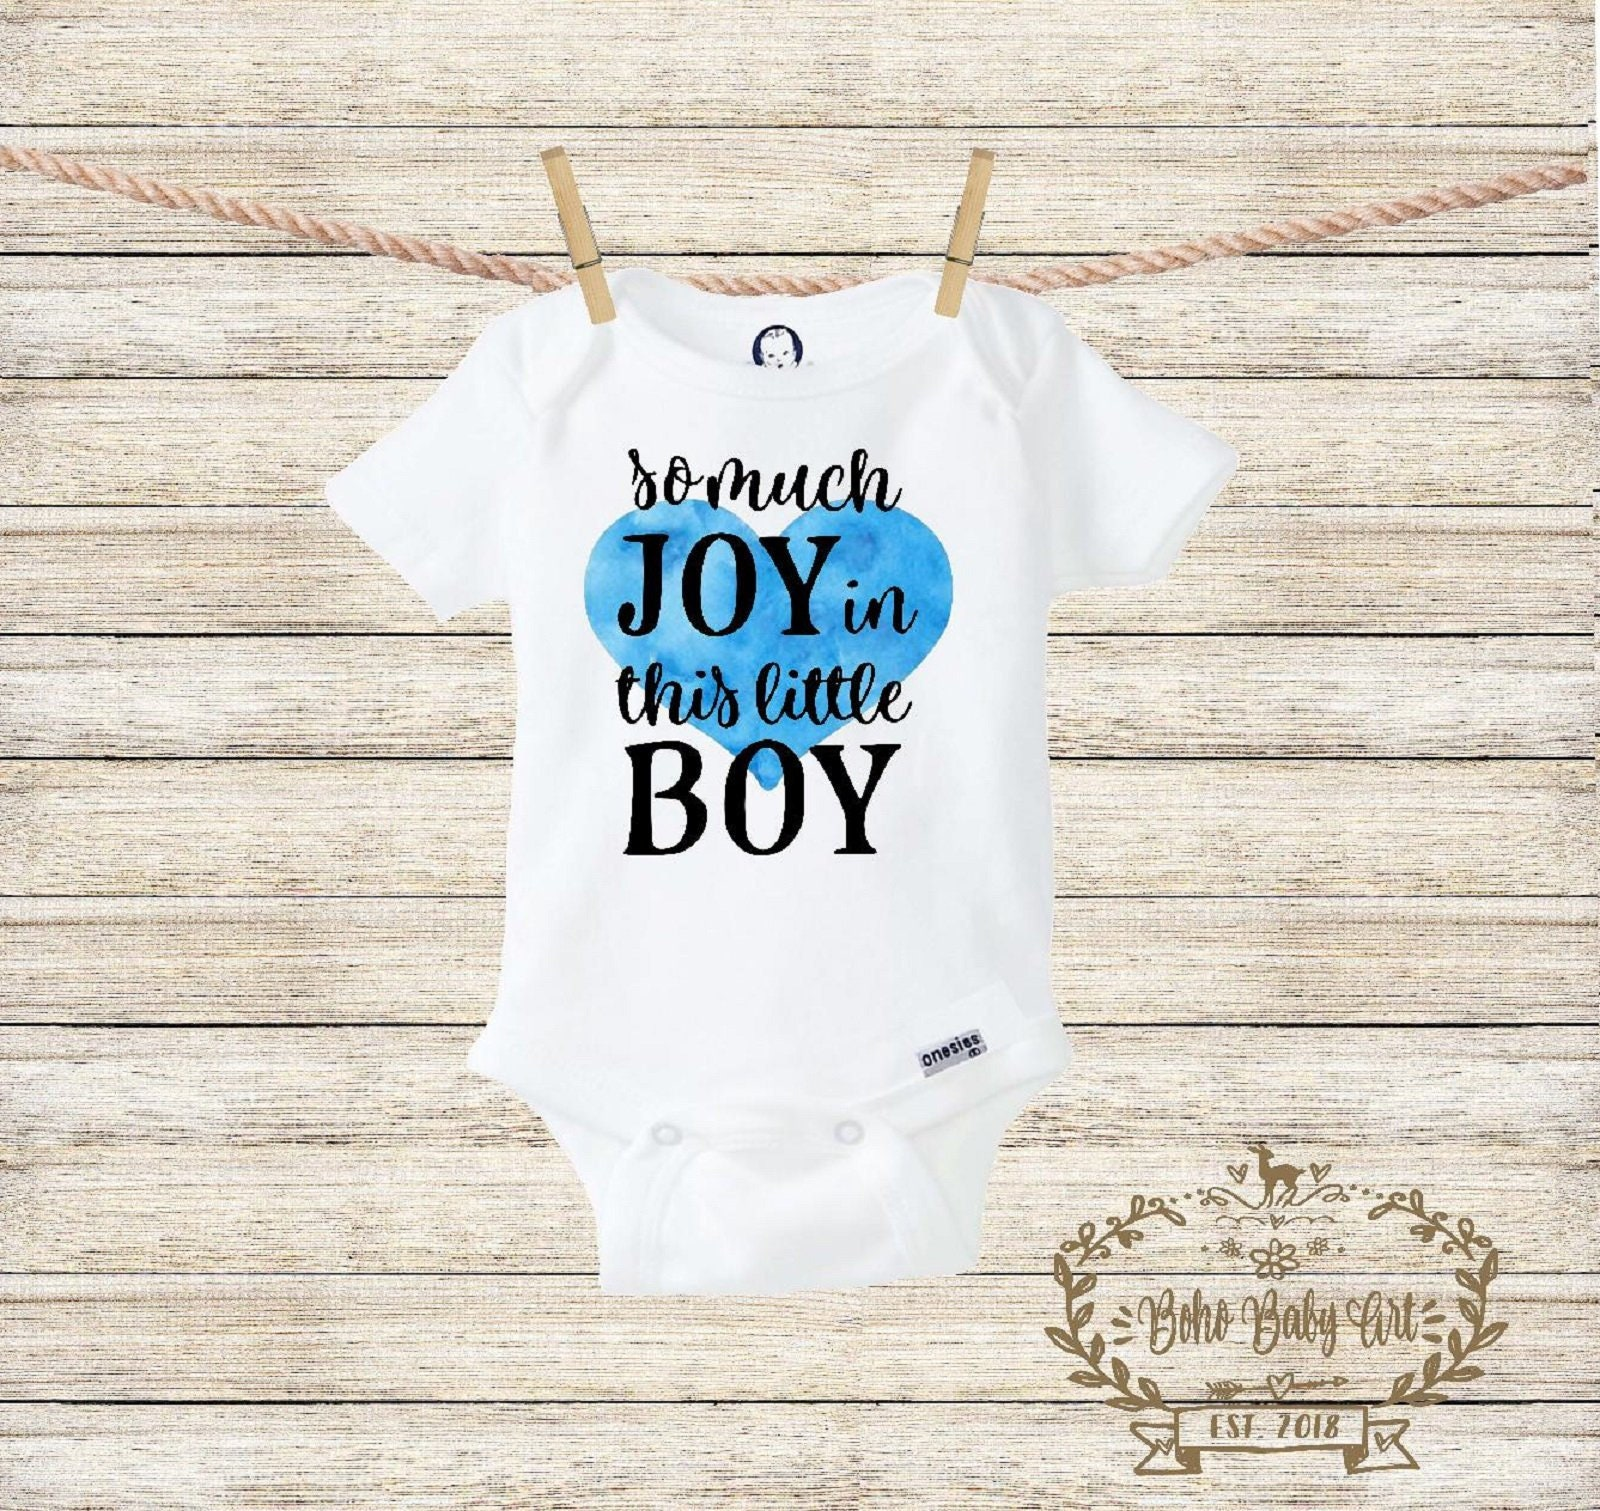 075ad9c1e0d So Much Joy in this Little Boy Onesie® Baby Boy Clothes Floral